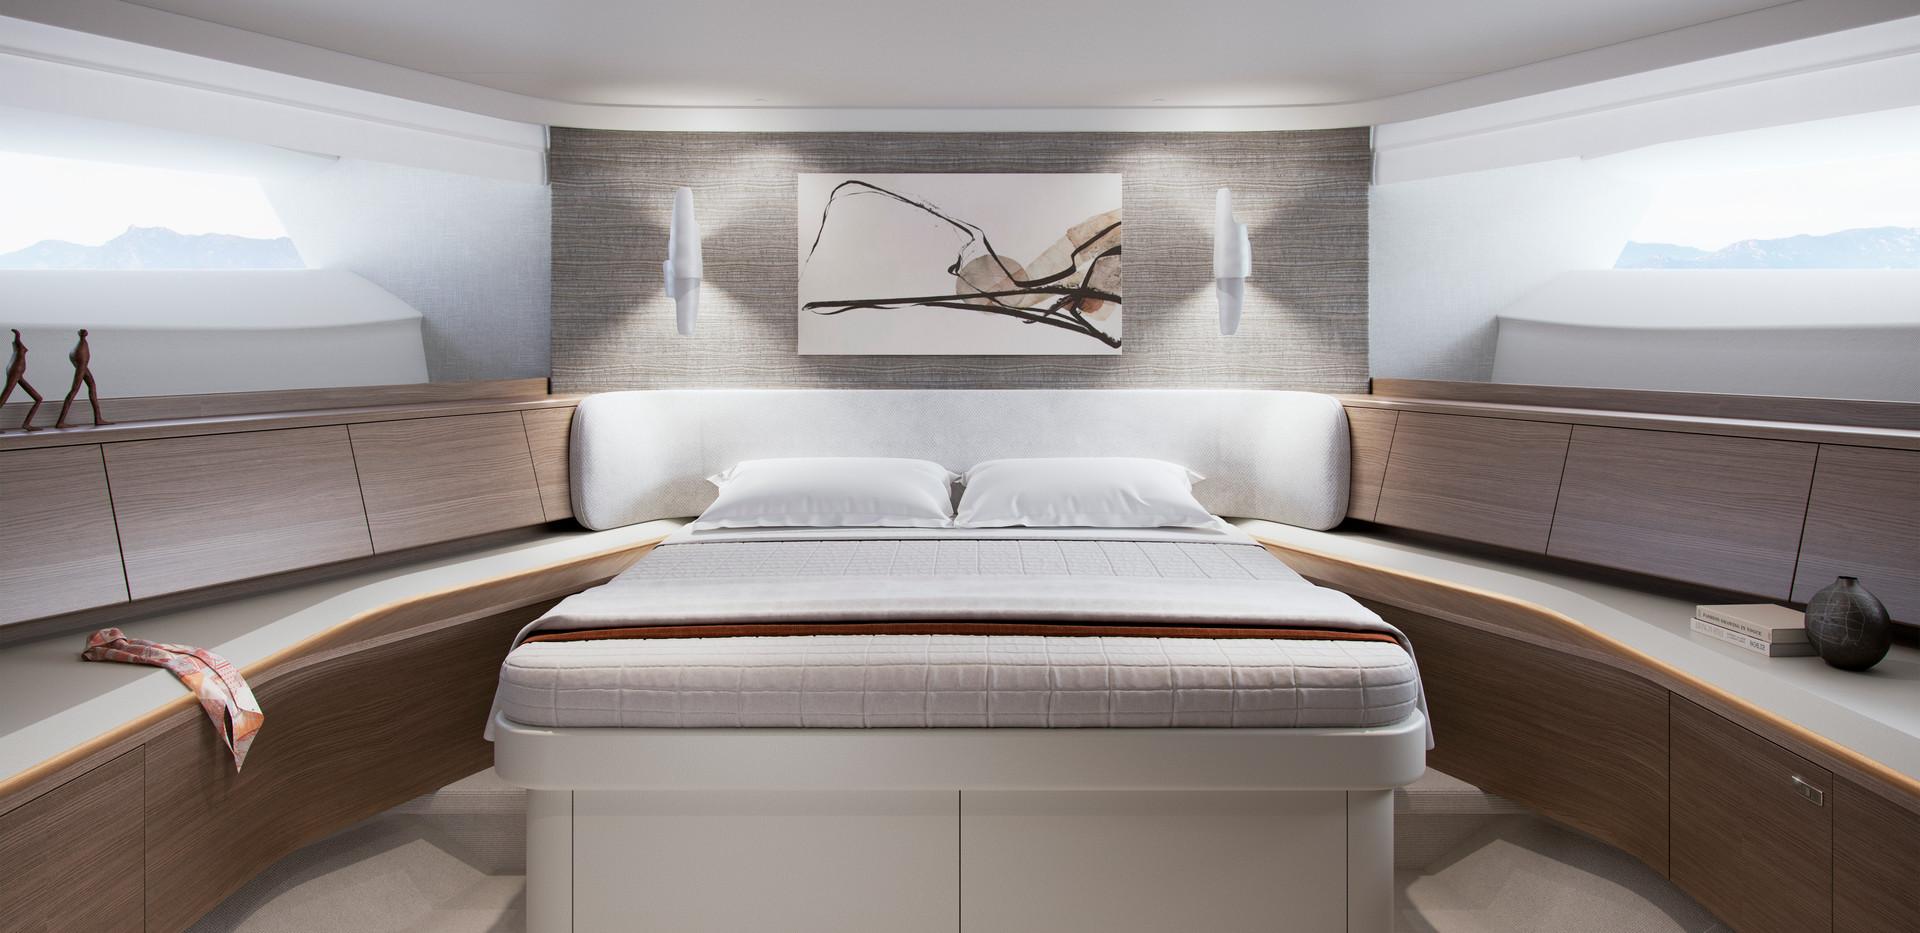 x95-interior-forward-stateroom-cgi.jpg